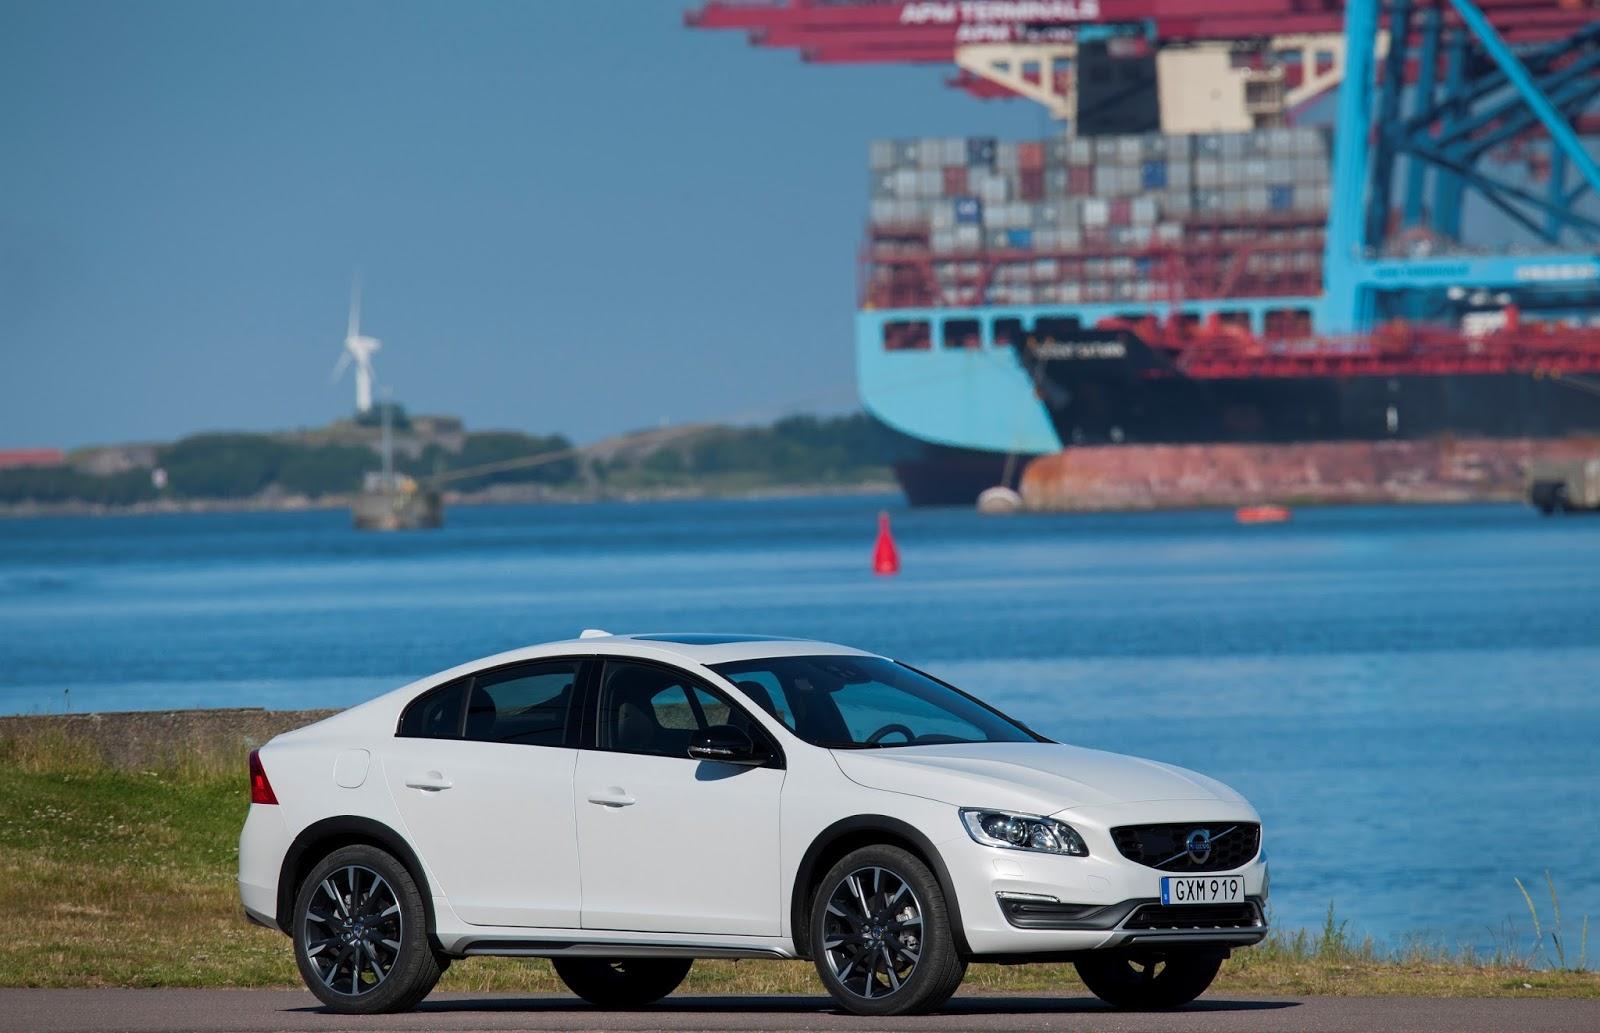 VOLVO%2BS60%2BCROSS%2BCOUNTRY%2B1 Η Volvo με το νέο S60 Cross Country δημιουργεί το πρώτο sedan με διττό χαρακτήρα